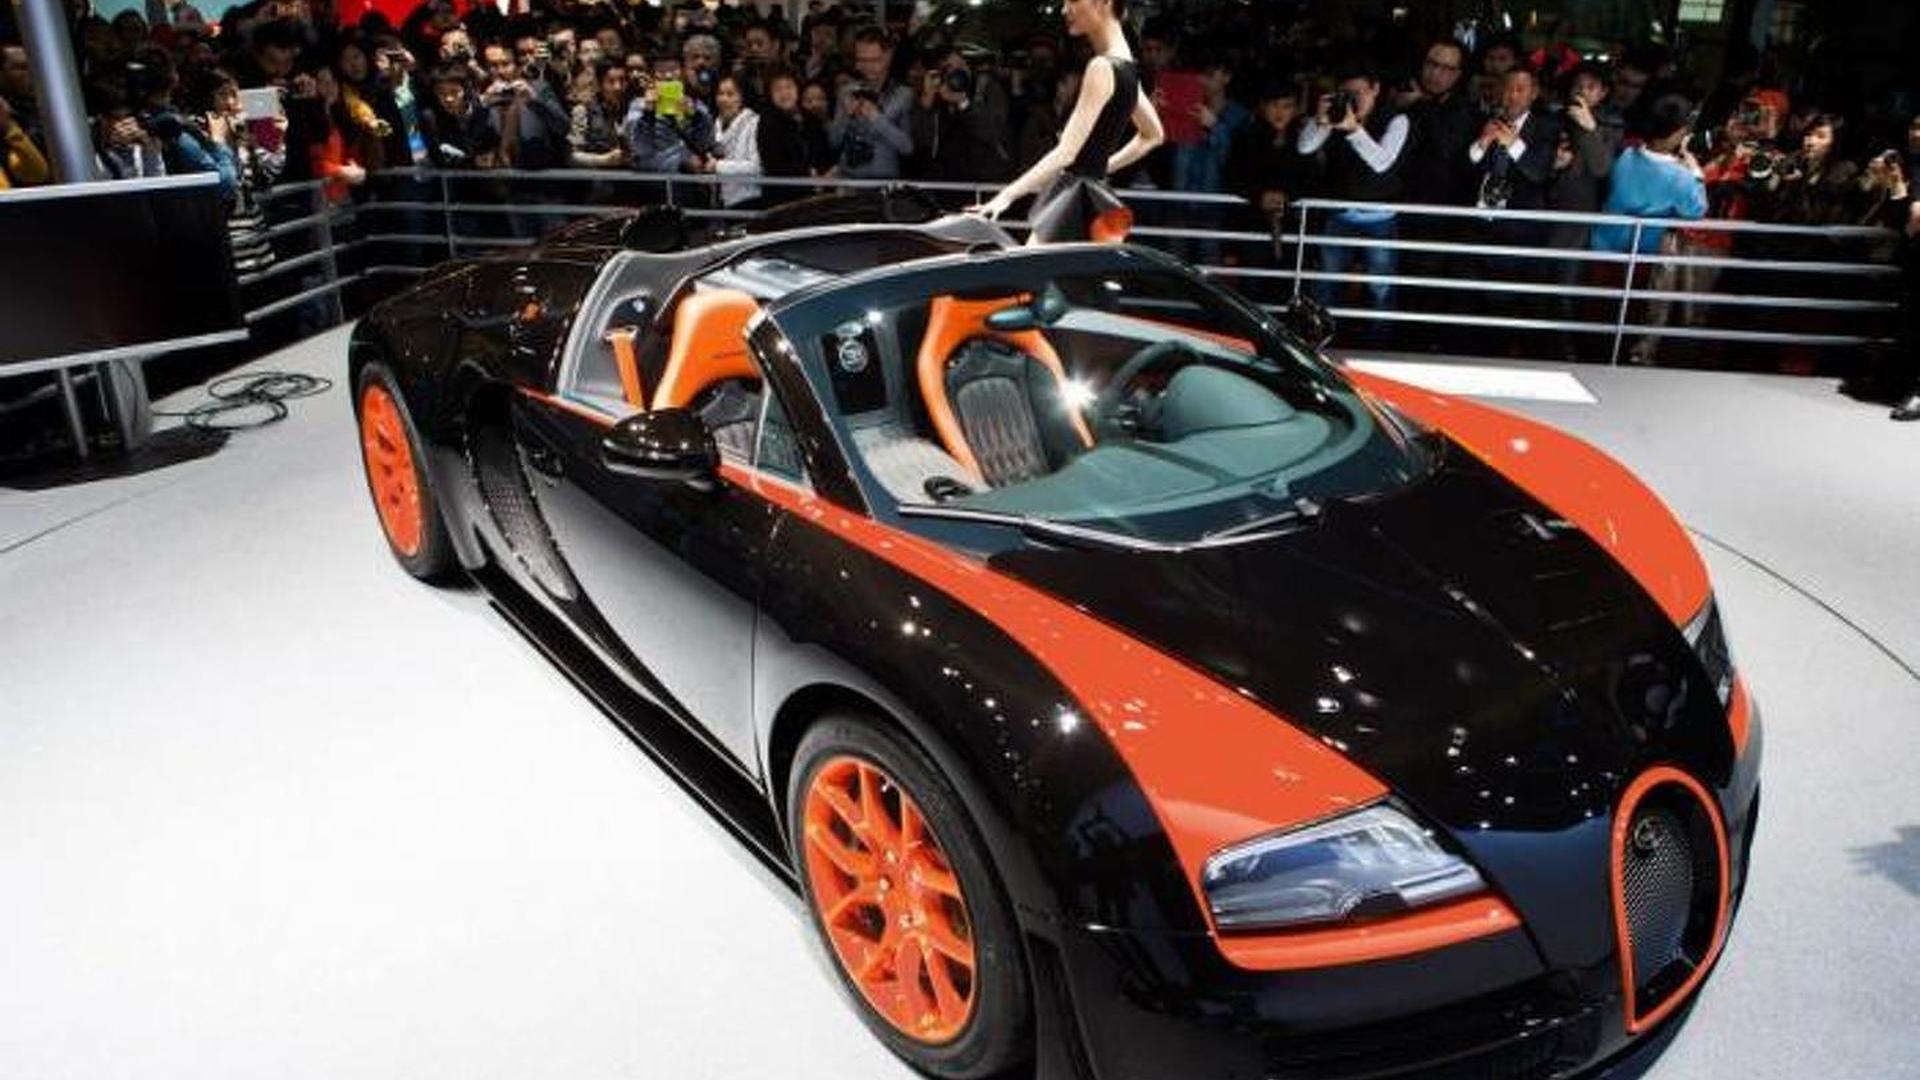 2013-380182-bugatti-veyron-grand-sport-vitesse-world-record-car-edition-at-2013-auto-shang1 Inspiring Bugatti Veyron Grand Sport Vitesse Wrc Cars Trend